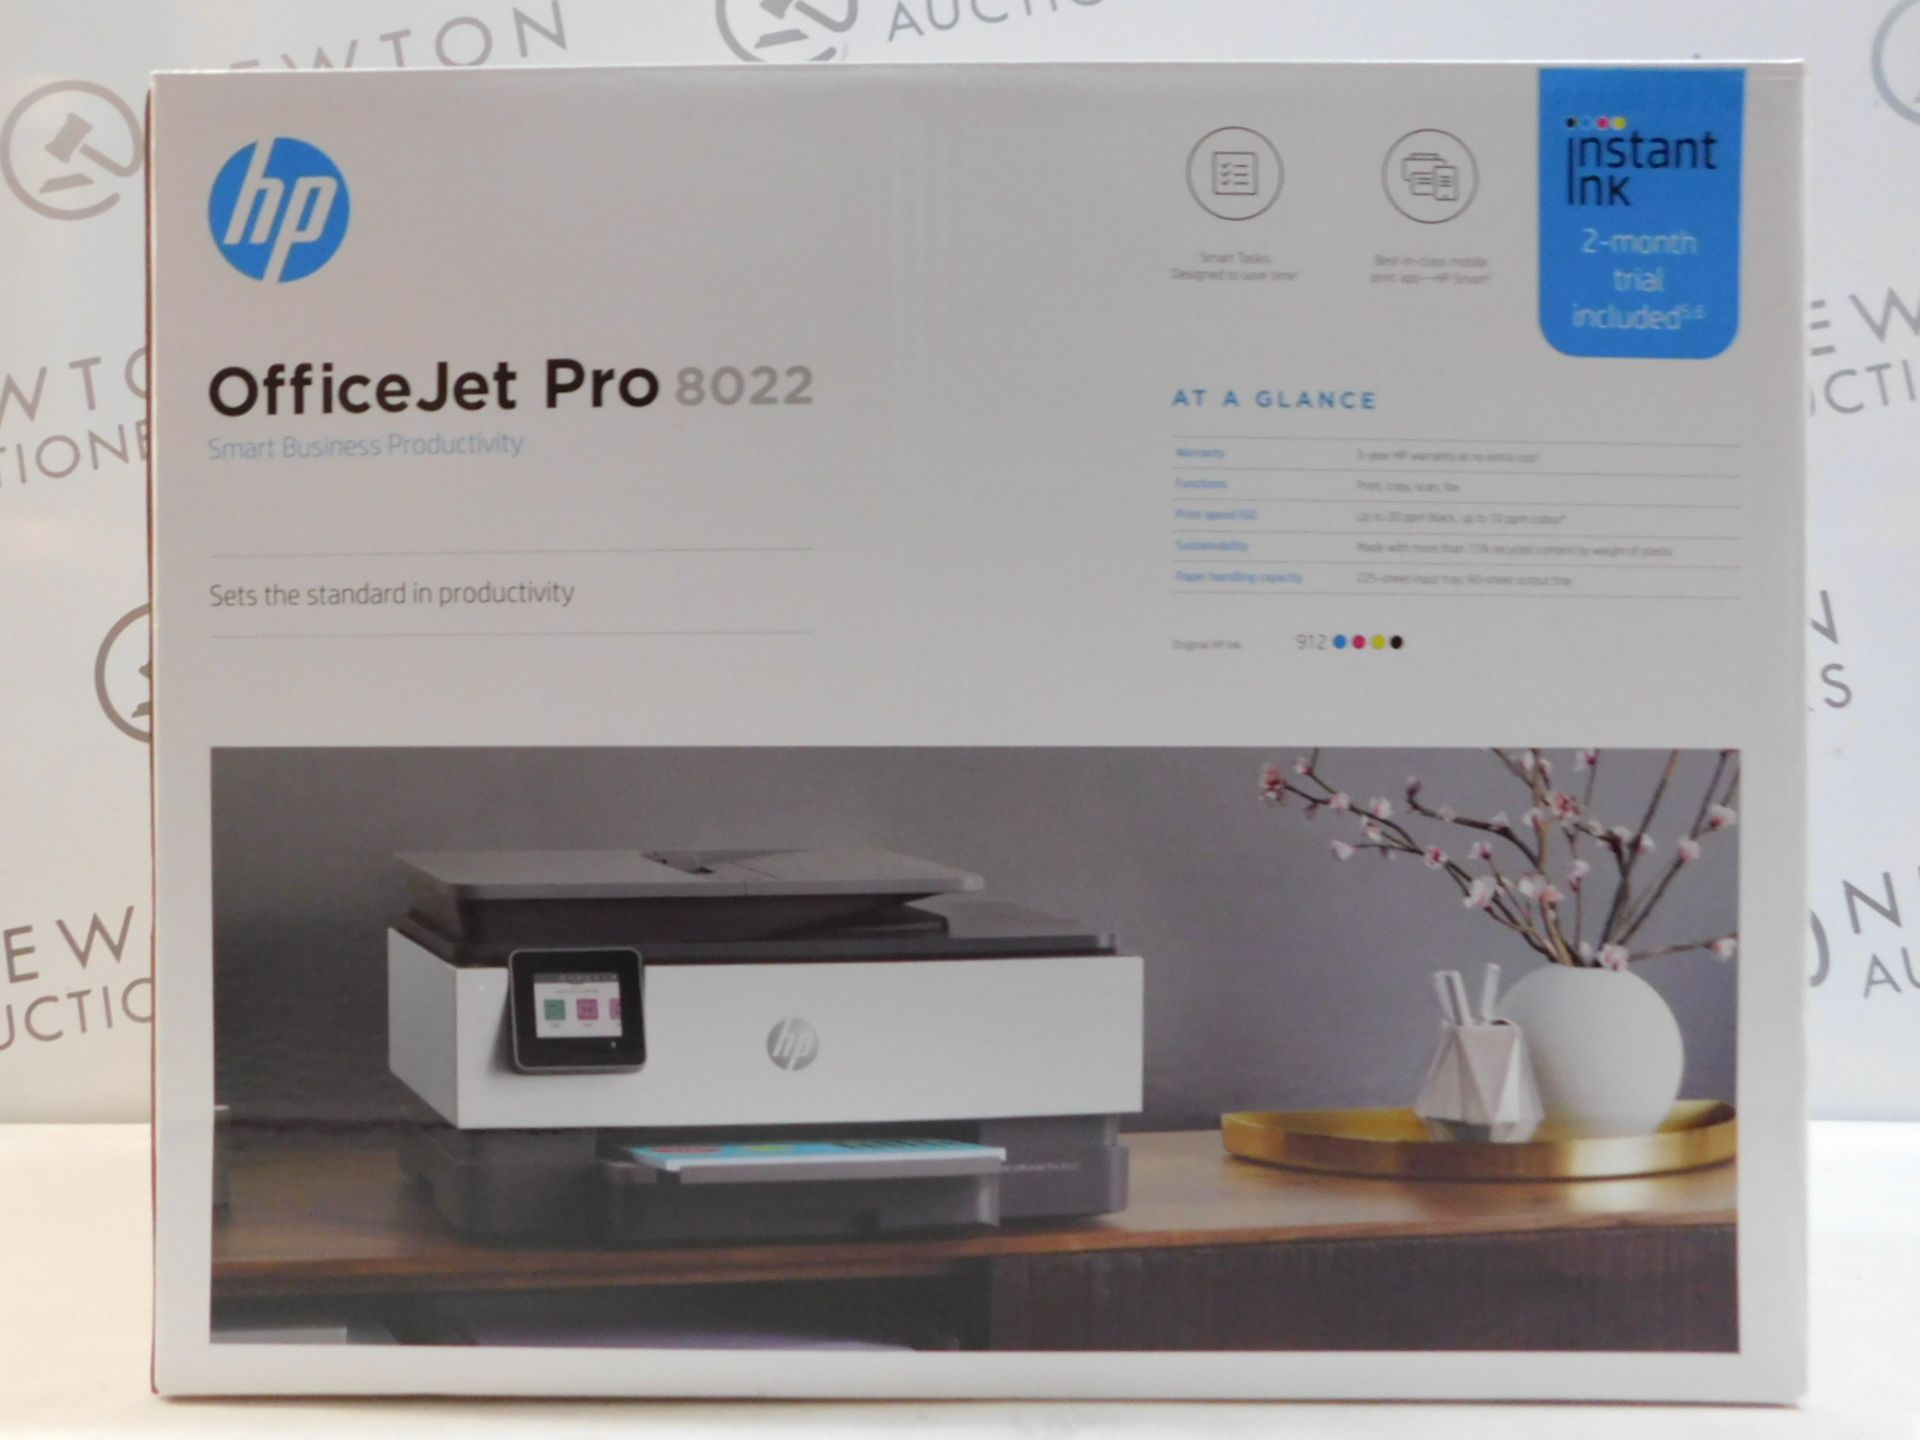 1 BOXED HP OFFICEJET PRO 8022 ALL-IN-ONE INKJET PRINTER RRP £149